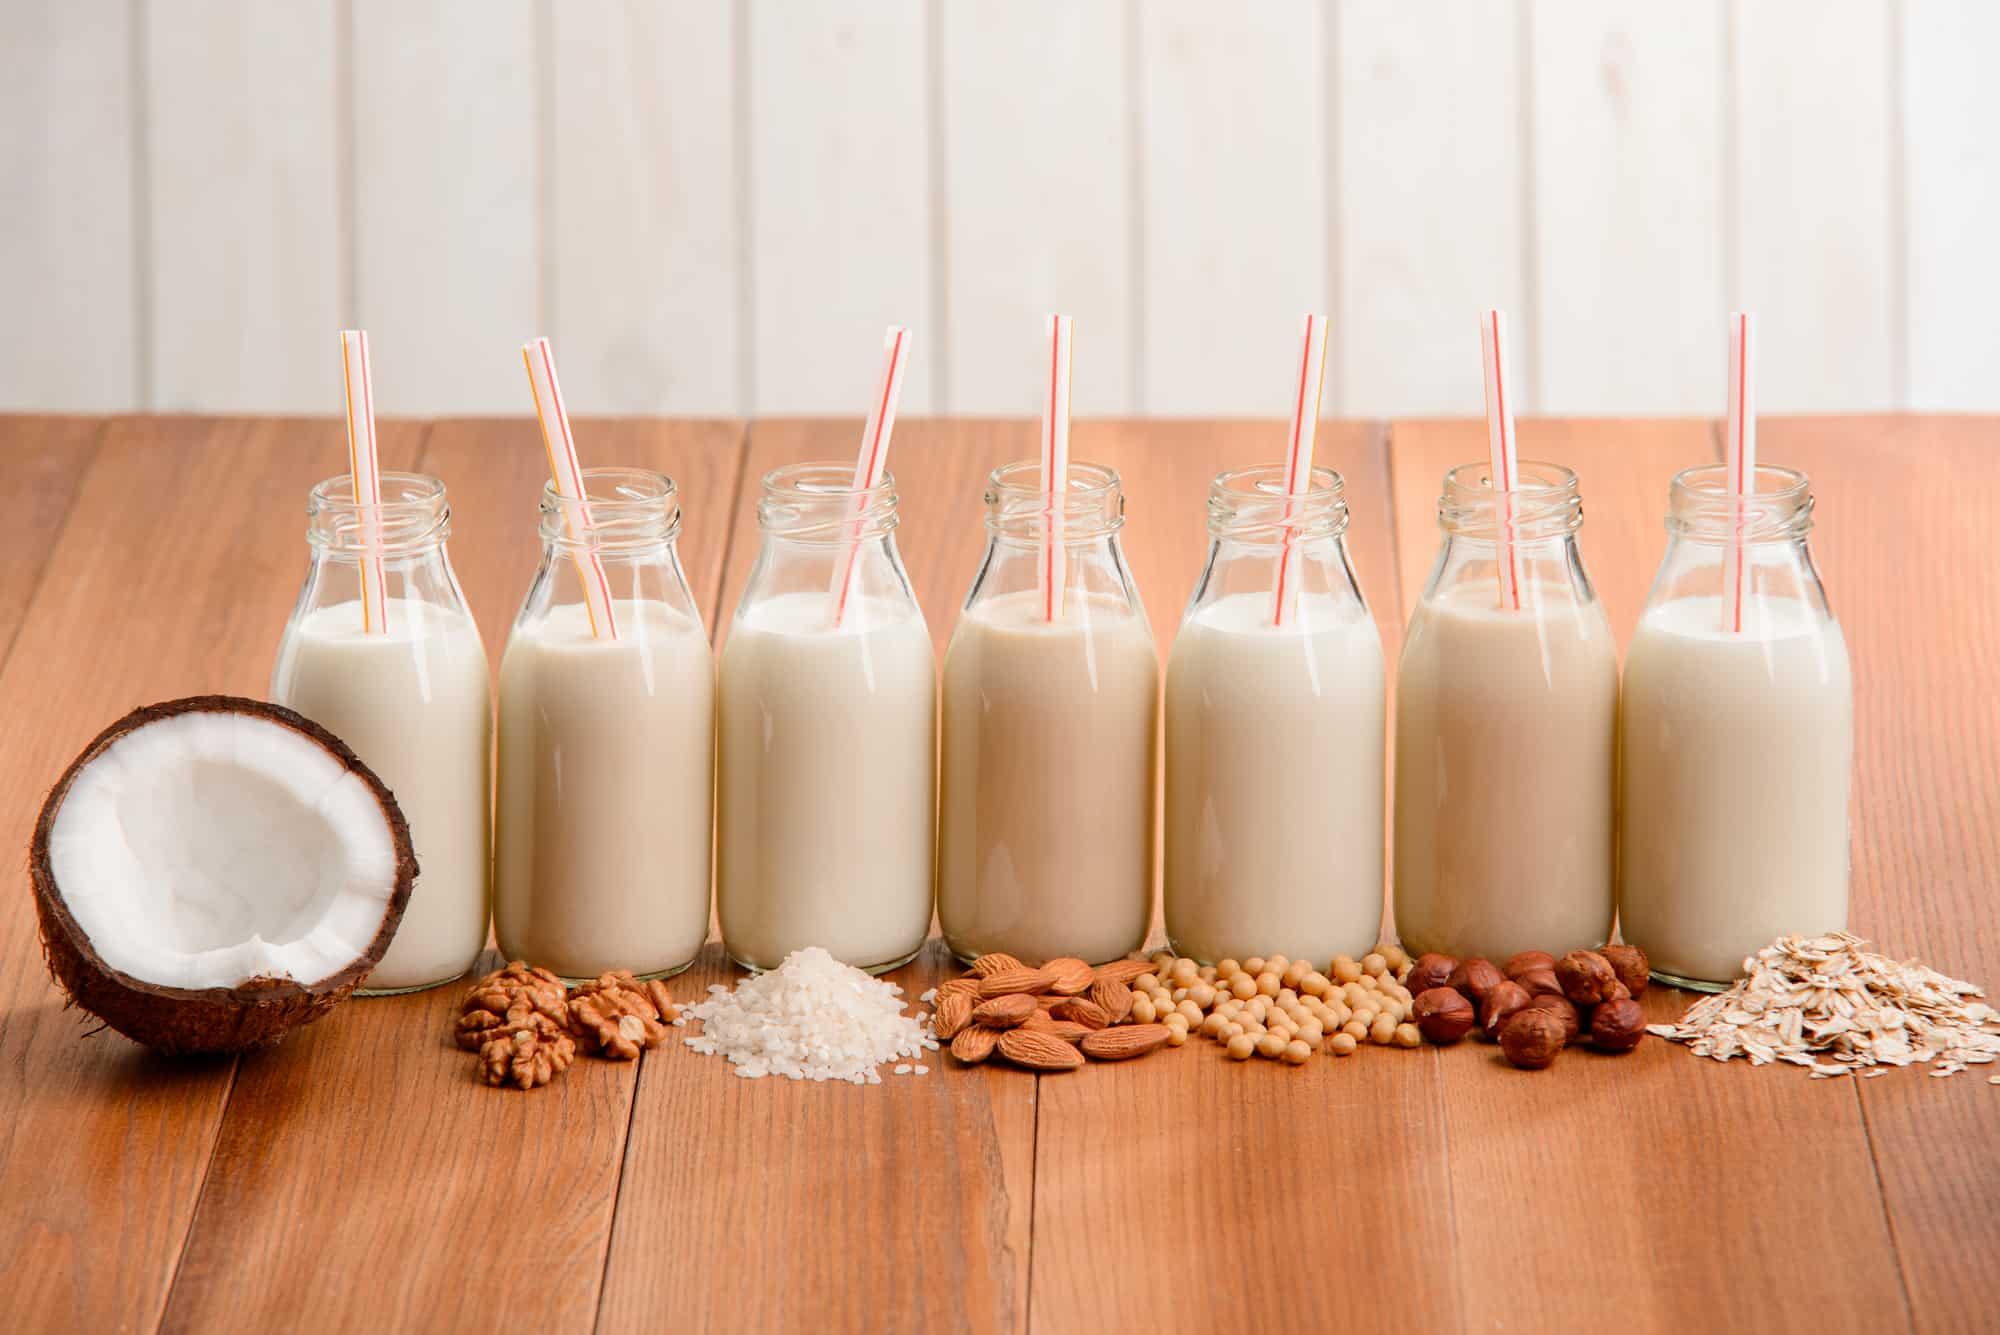 Bottles of assorted vegan drinks: coconut, walnut, rice, almond, soy, hazelnut and oatmeal milks.